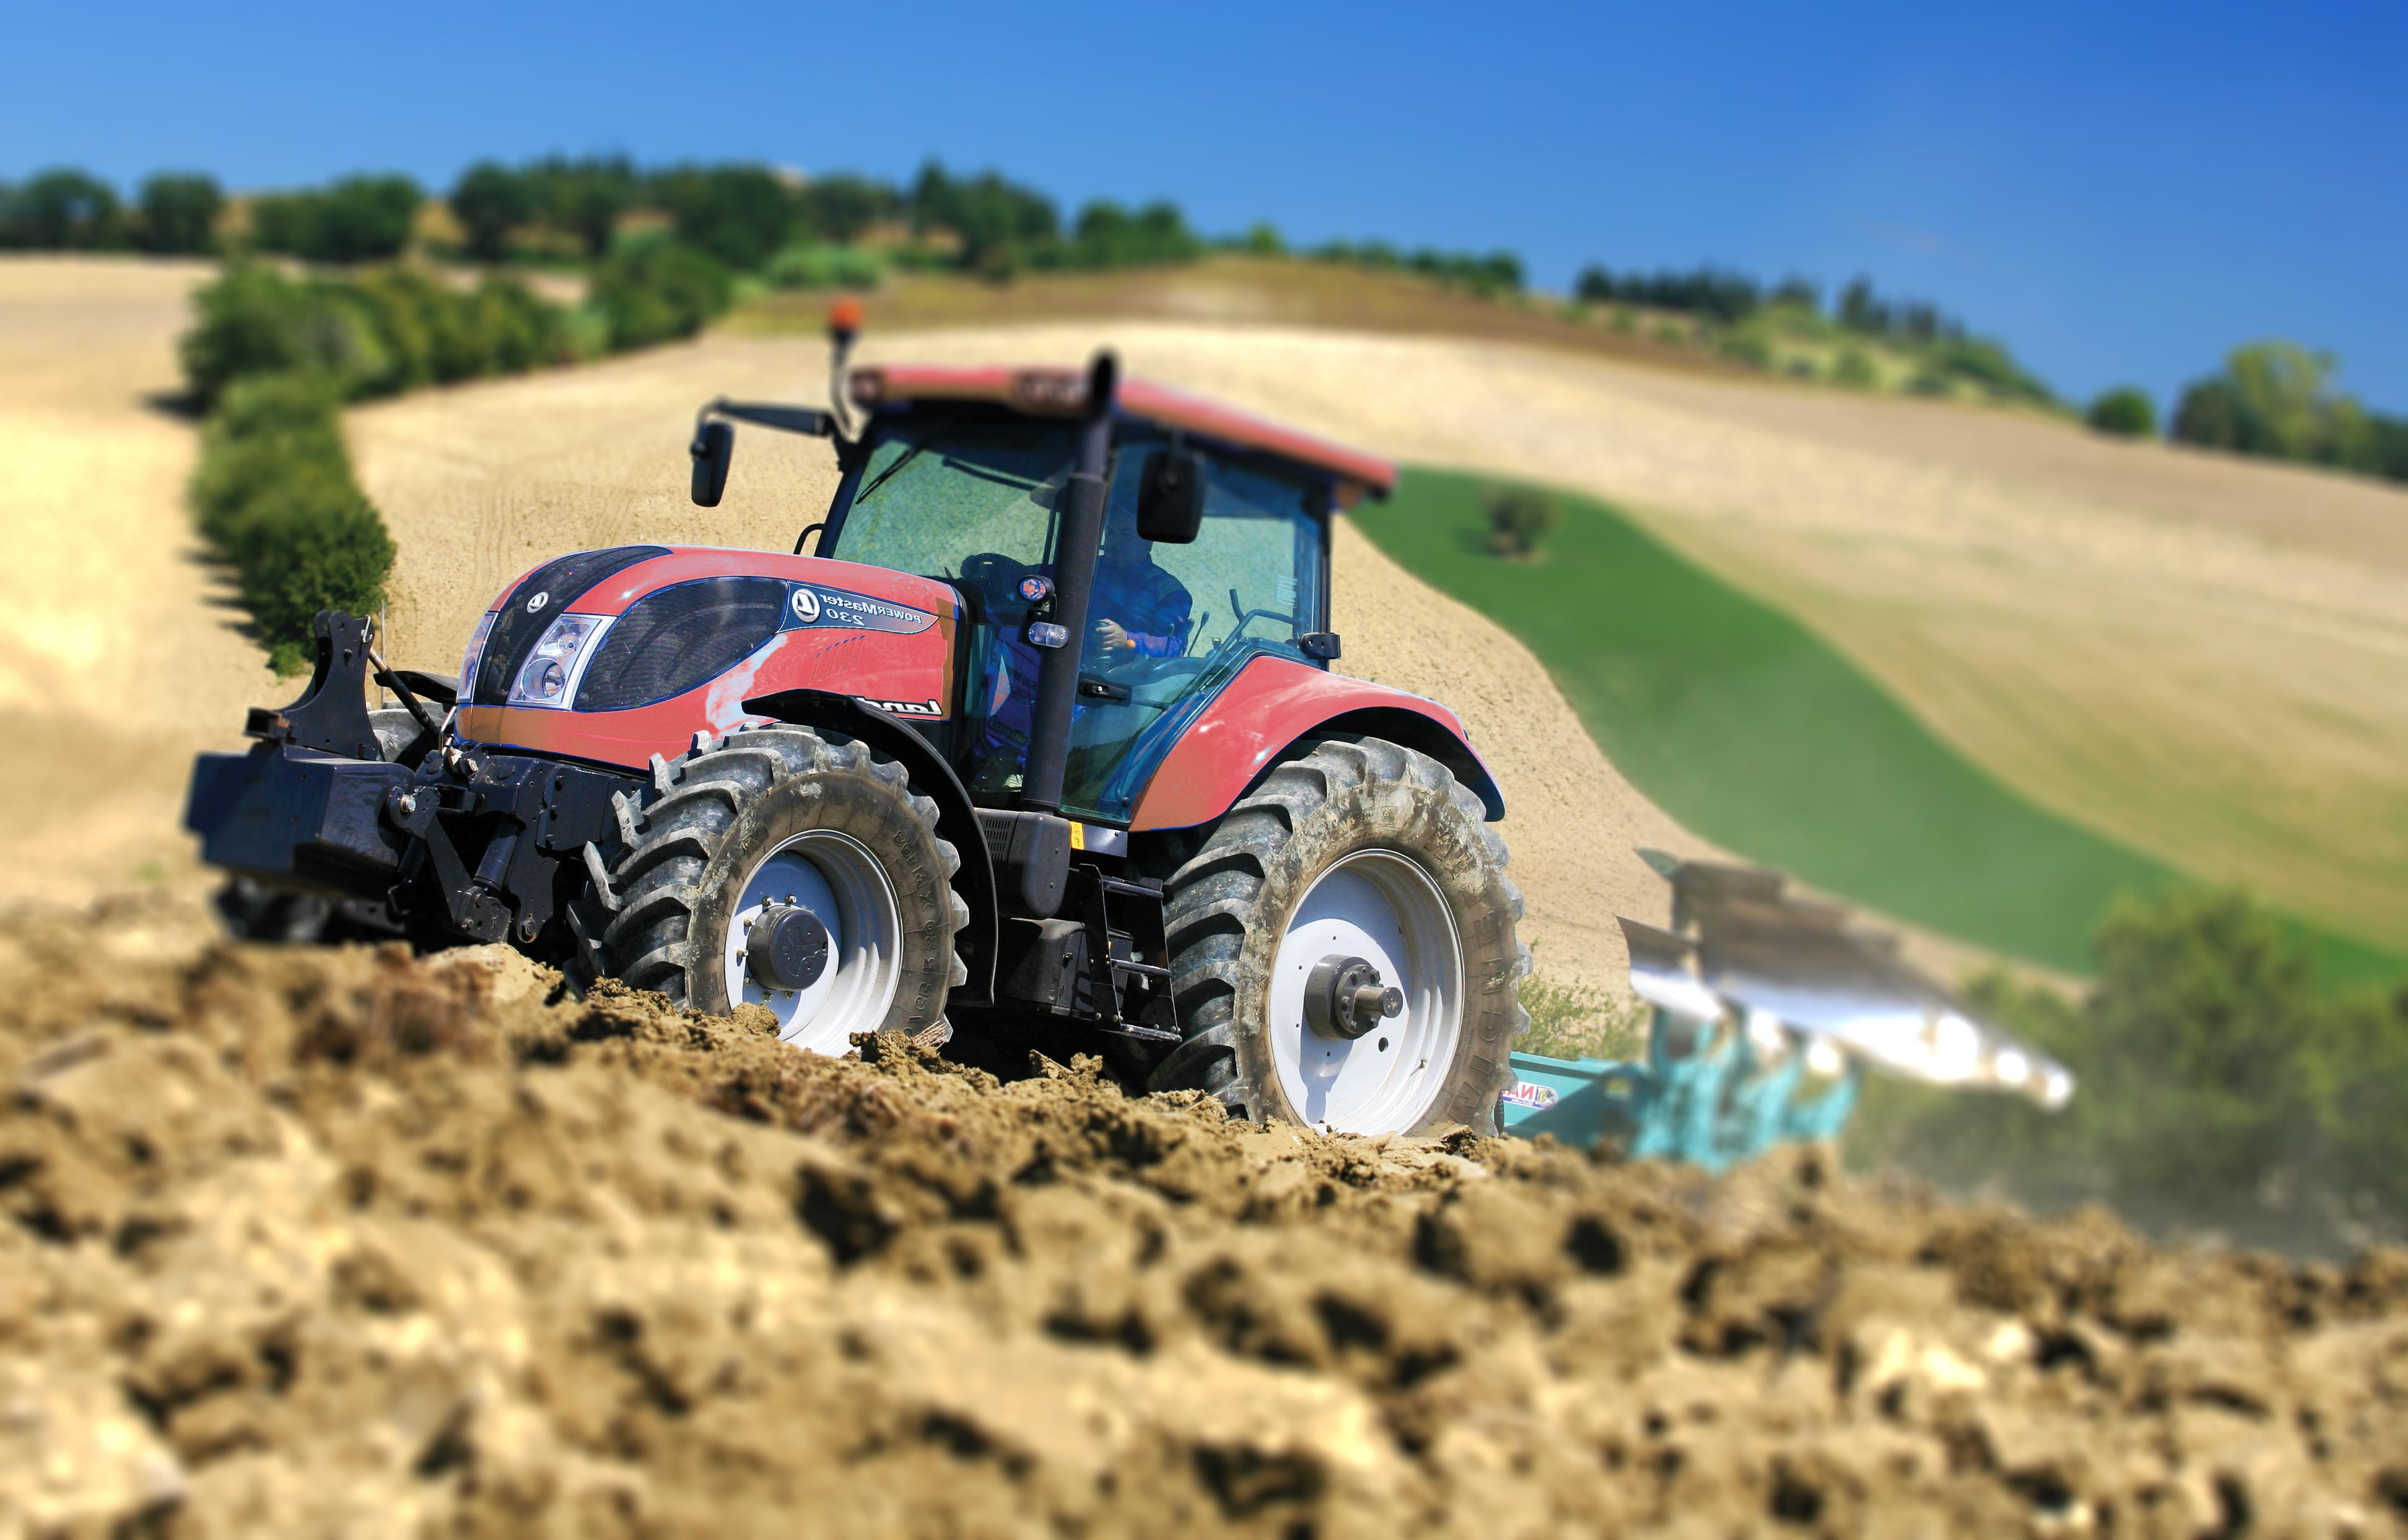 Macchine agricole gruppo polimar for Porrini macchine agricole